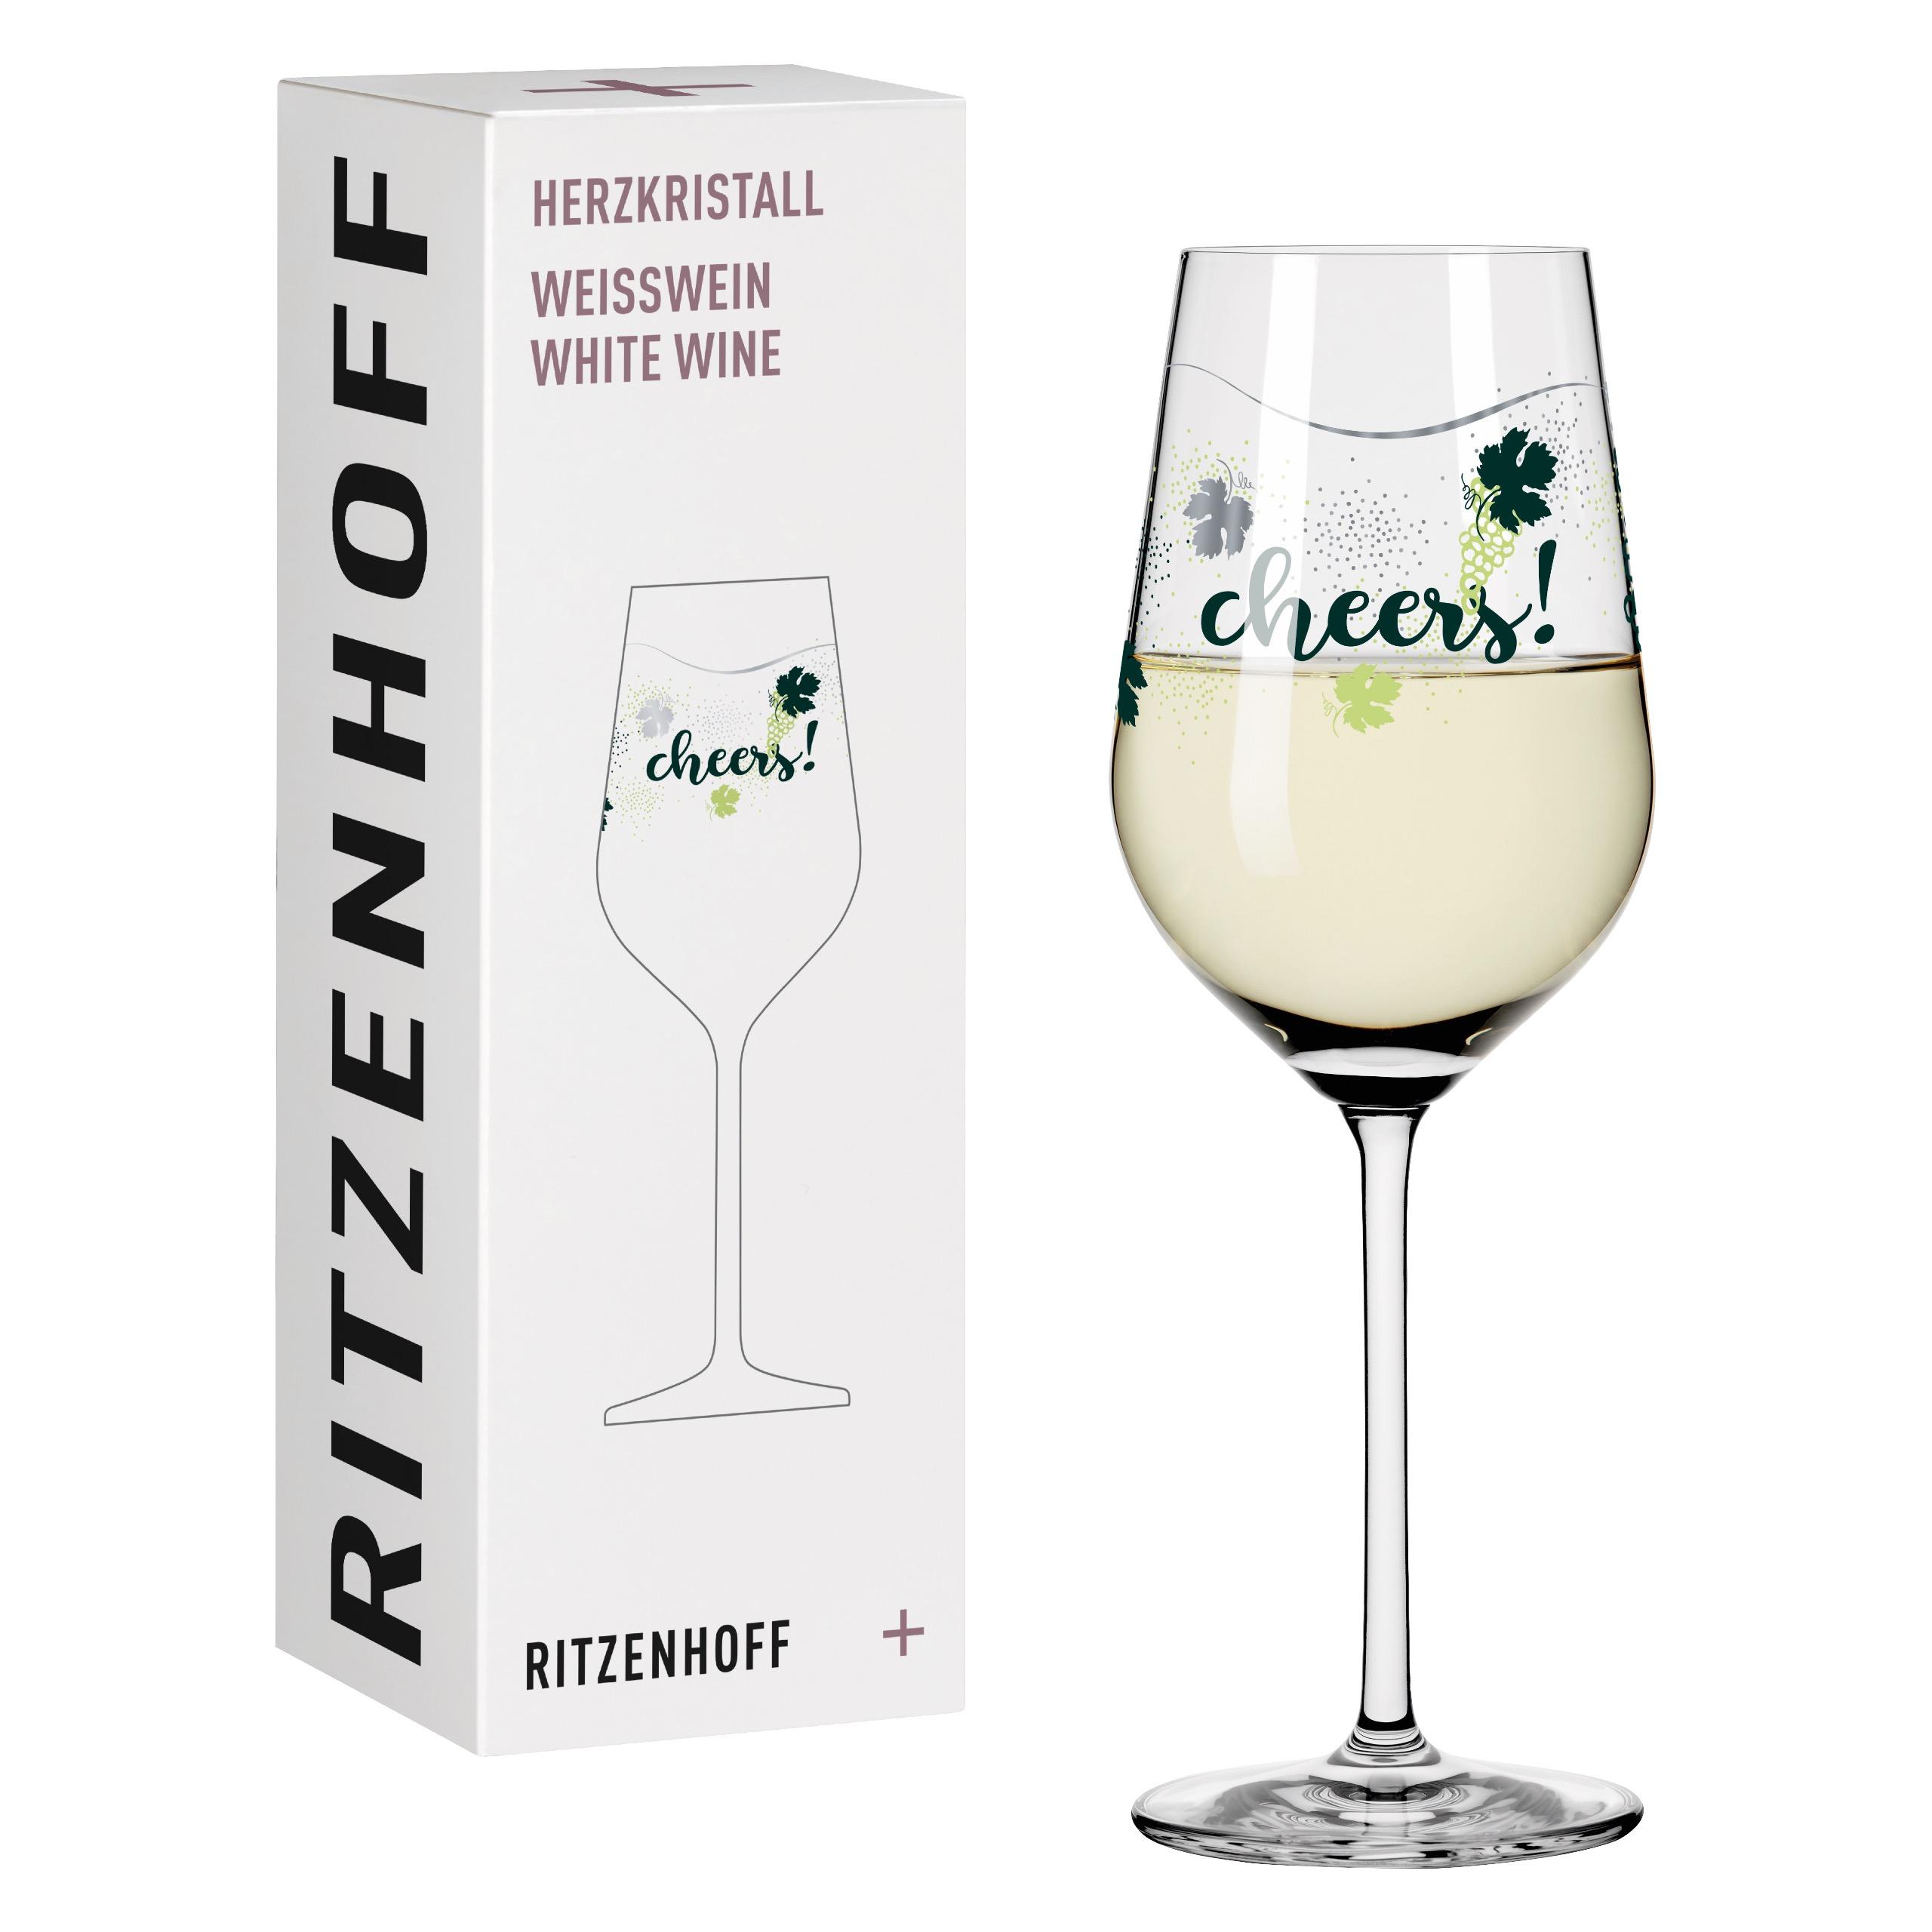 Ritzenhoff Crystal Heart White Wine Glass Kuhn